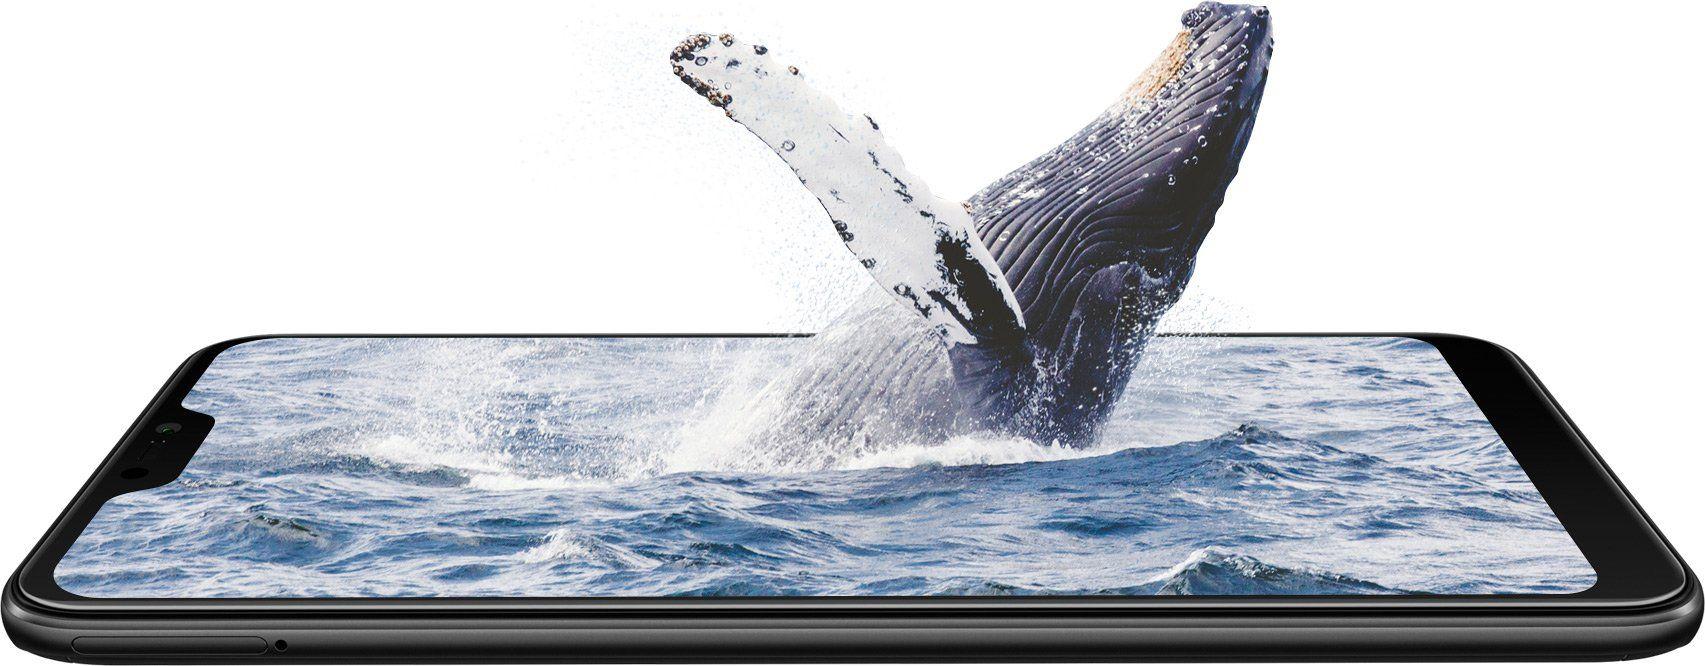 Xiaomi Mi A2 Lite дисплей